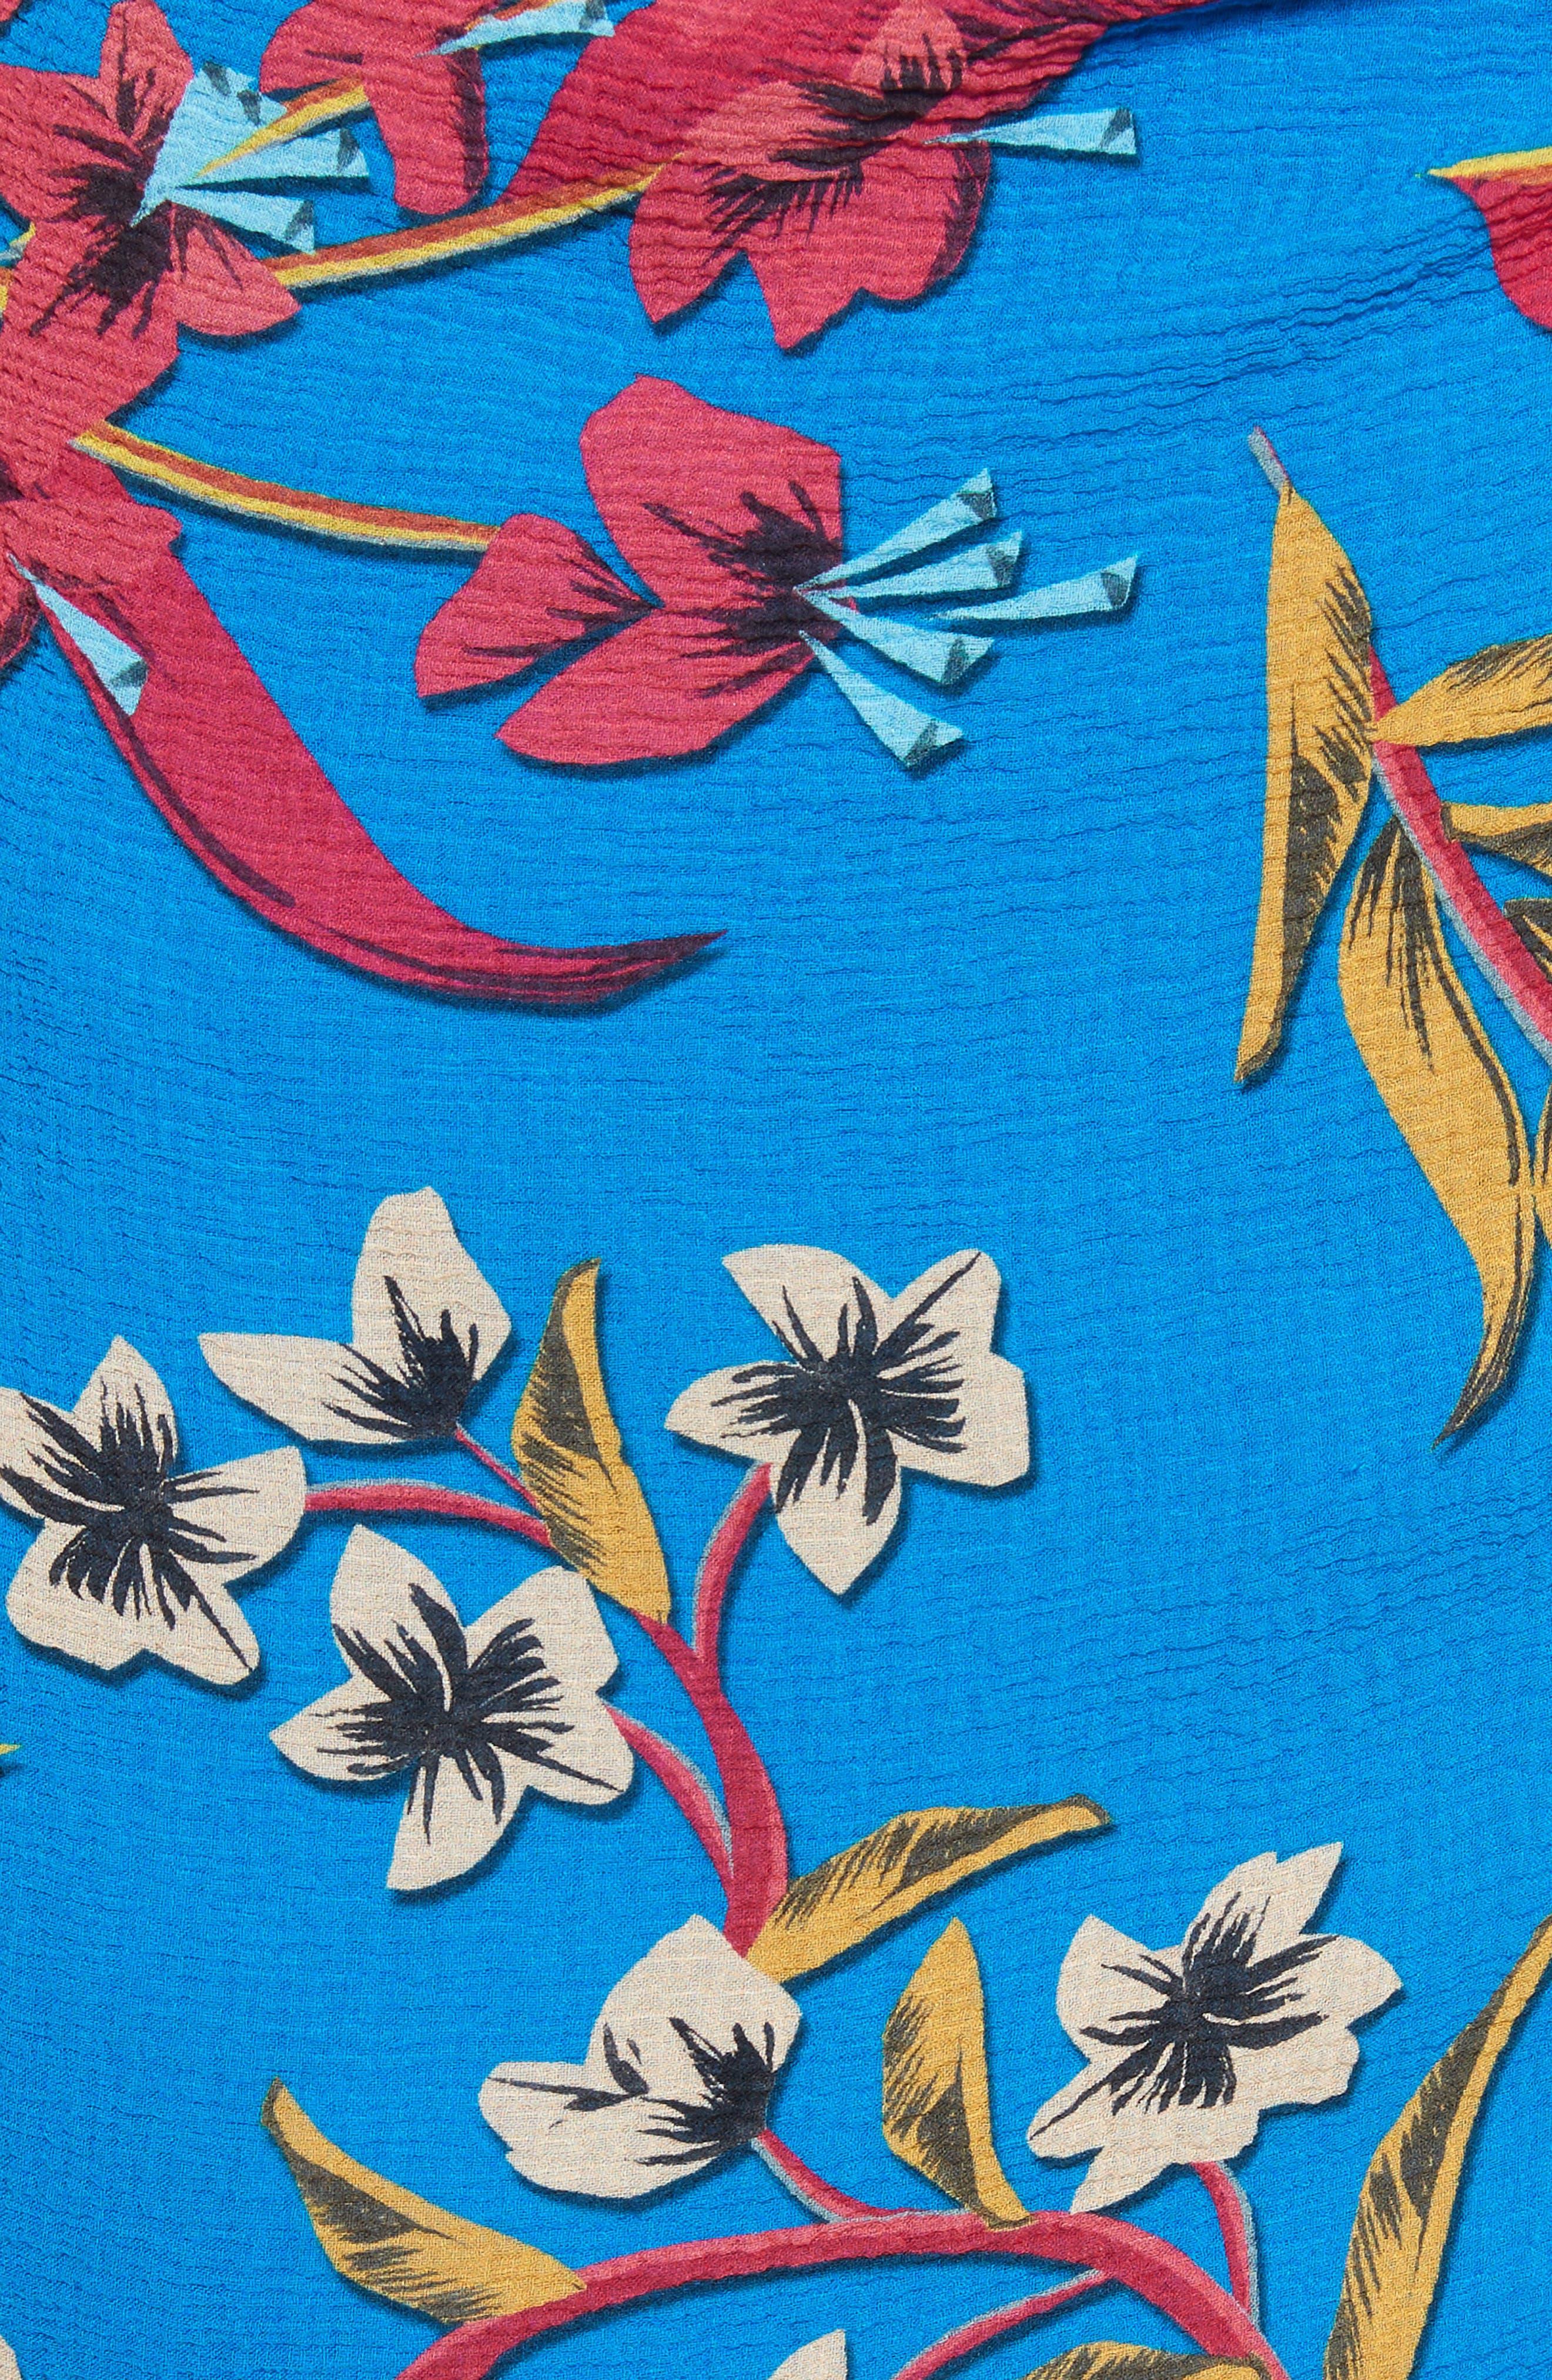 Jungle Floral Print Asymmetrical Ruffle Dress,                             Alternate thumbnail 5, color,                             410